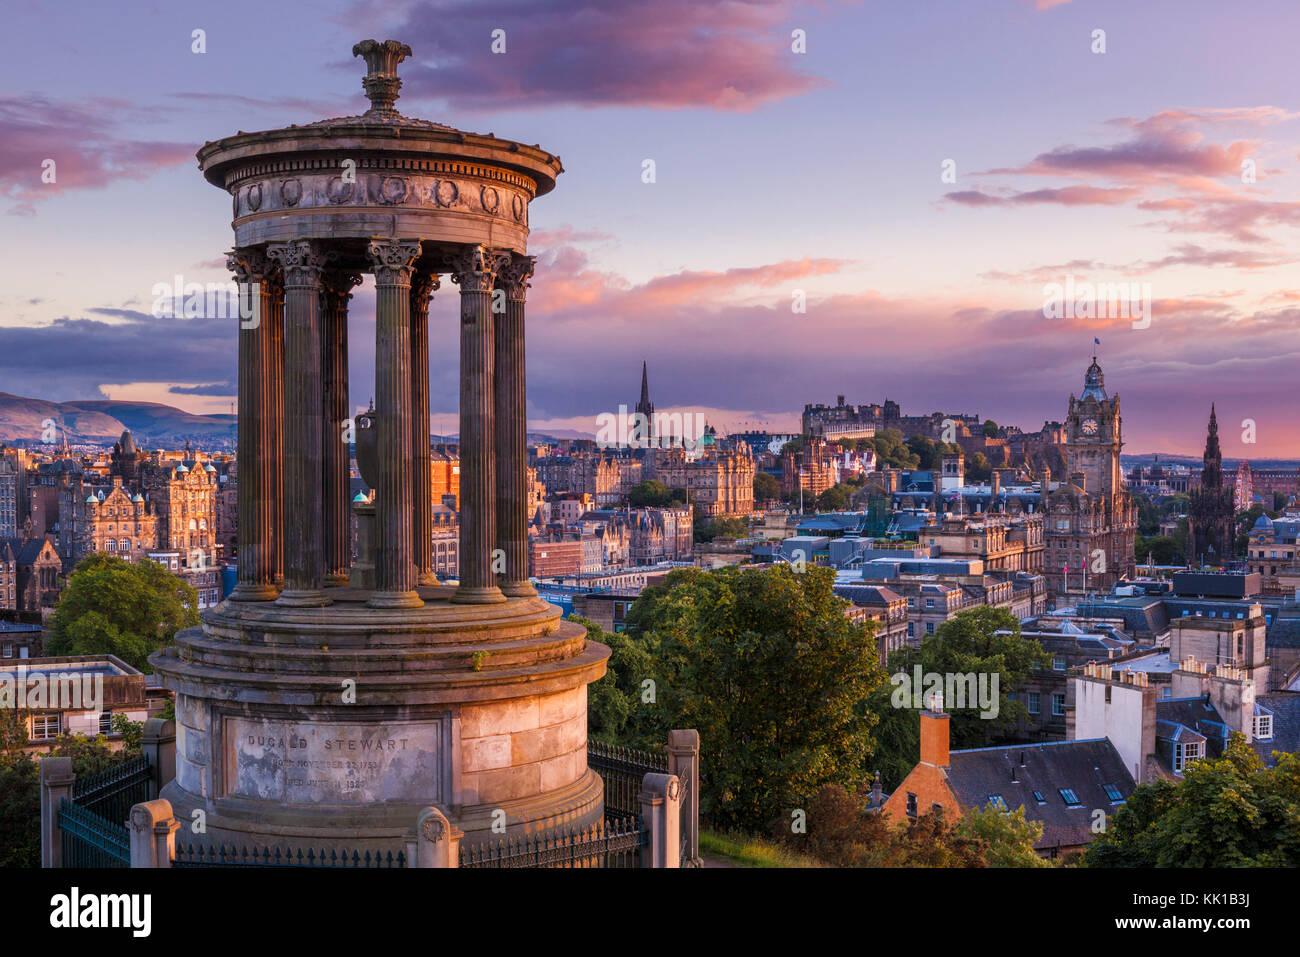 Edinburgh Scotland Edinburgh Dugald Stewart Monument, city centre and Skyline of Edinburgh, Calton Hill, Edinburgh, Midlothian, Scotland, UK, GB, Stock Photo